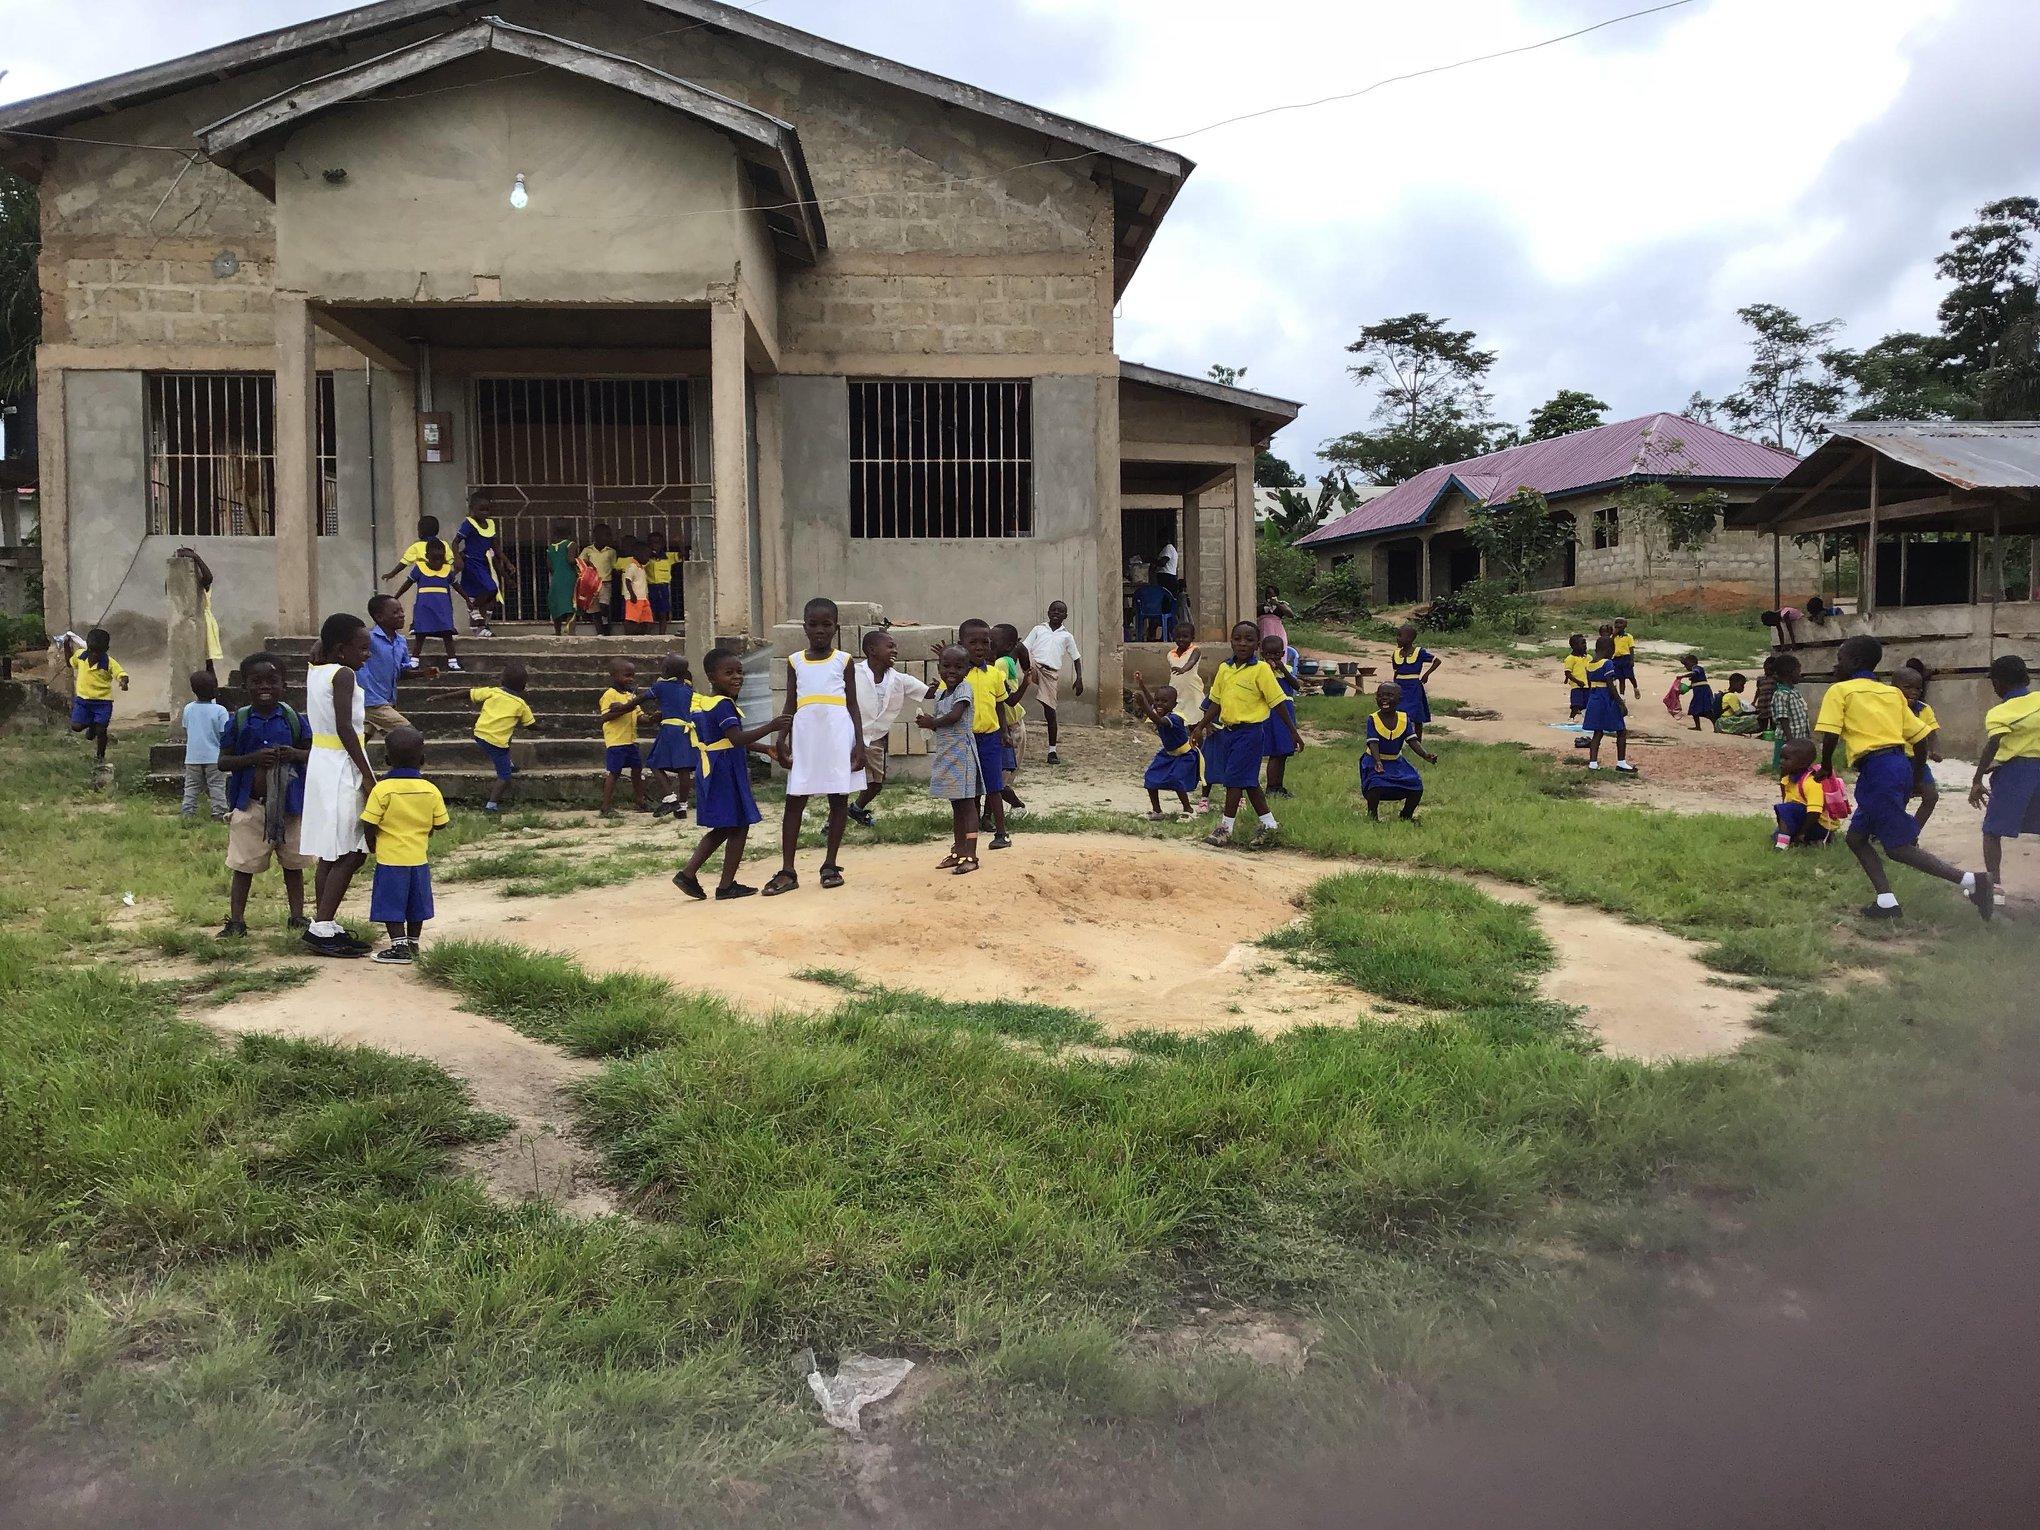 Primary school in Ofoase, Ghana.